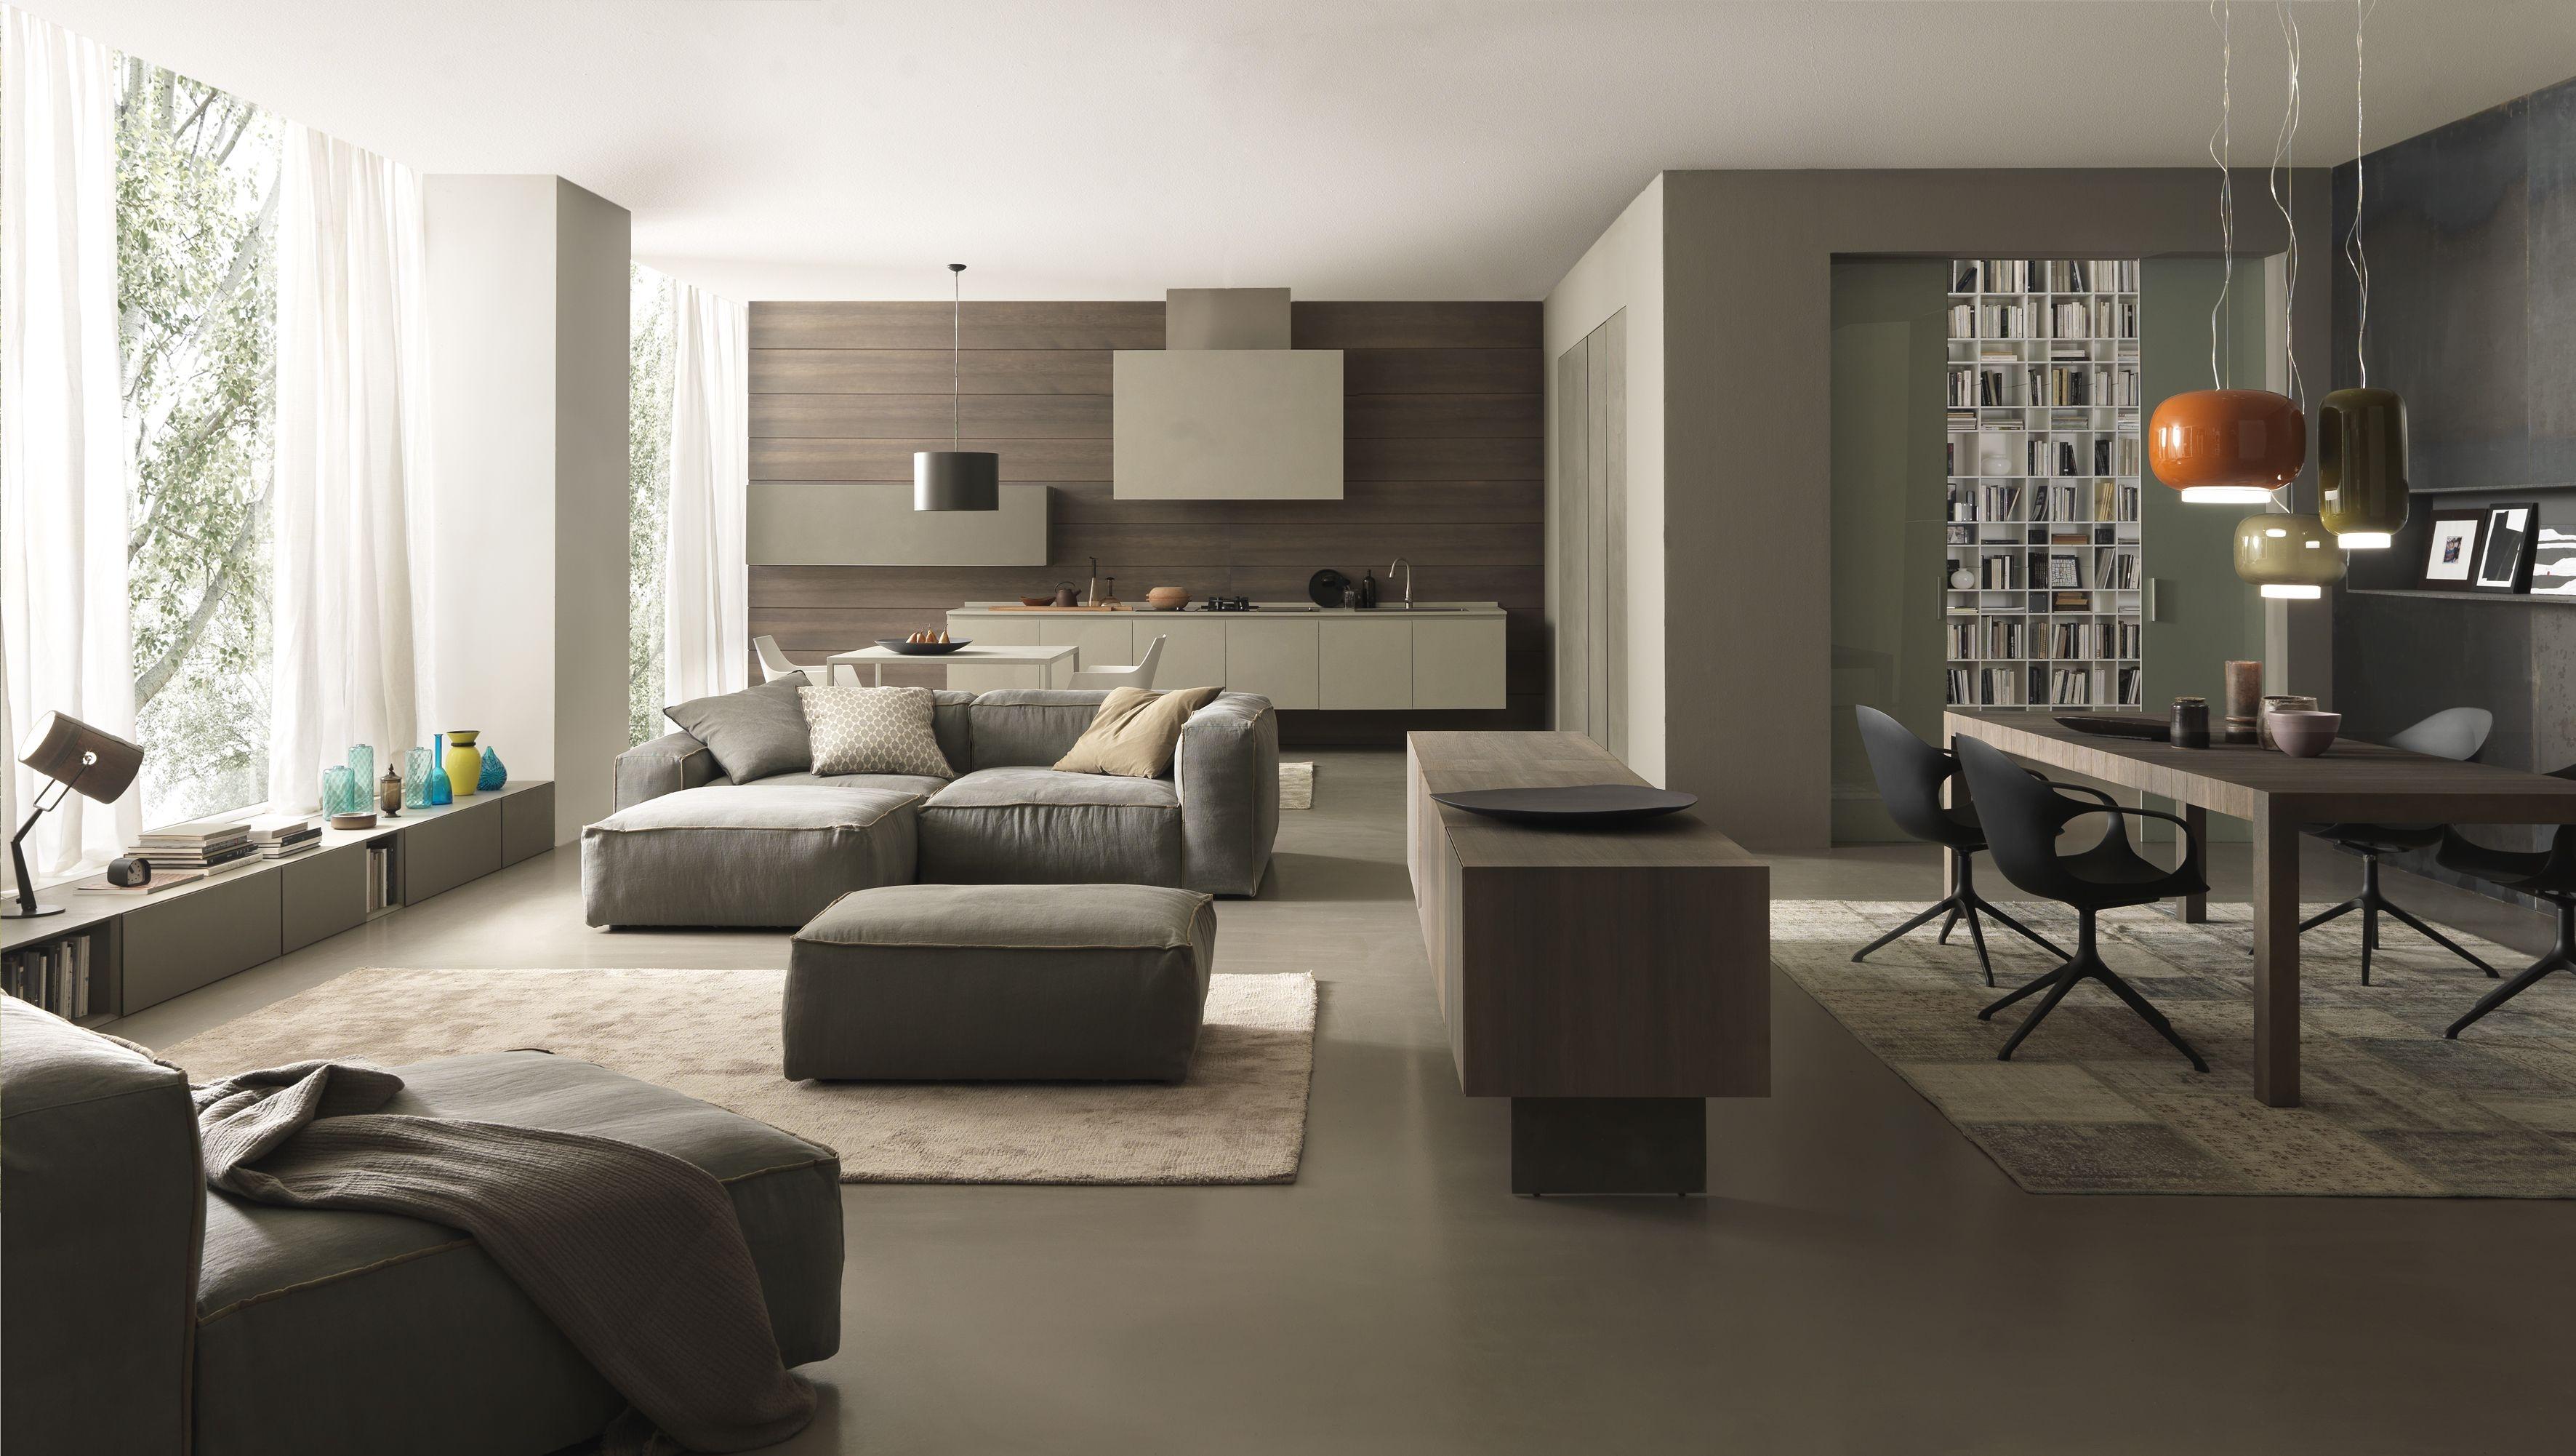 arredamento casa cucine : ... arredamento di interni a Genova Arte in Casa - immagine 0